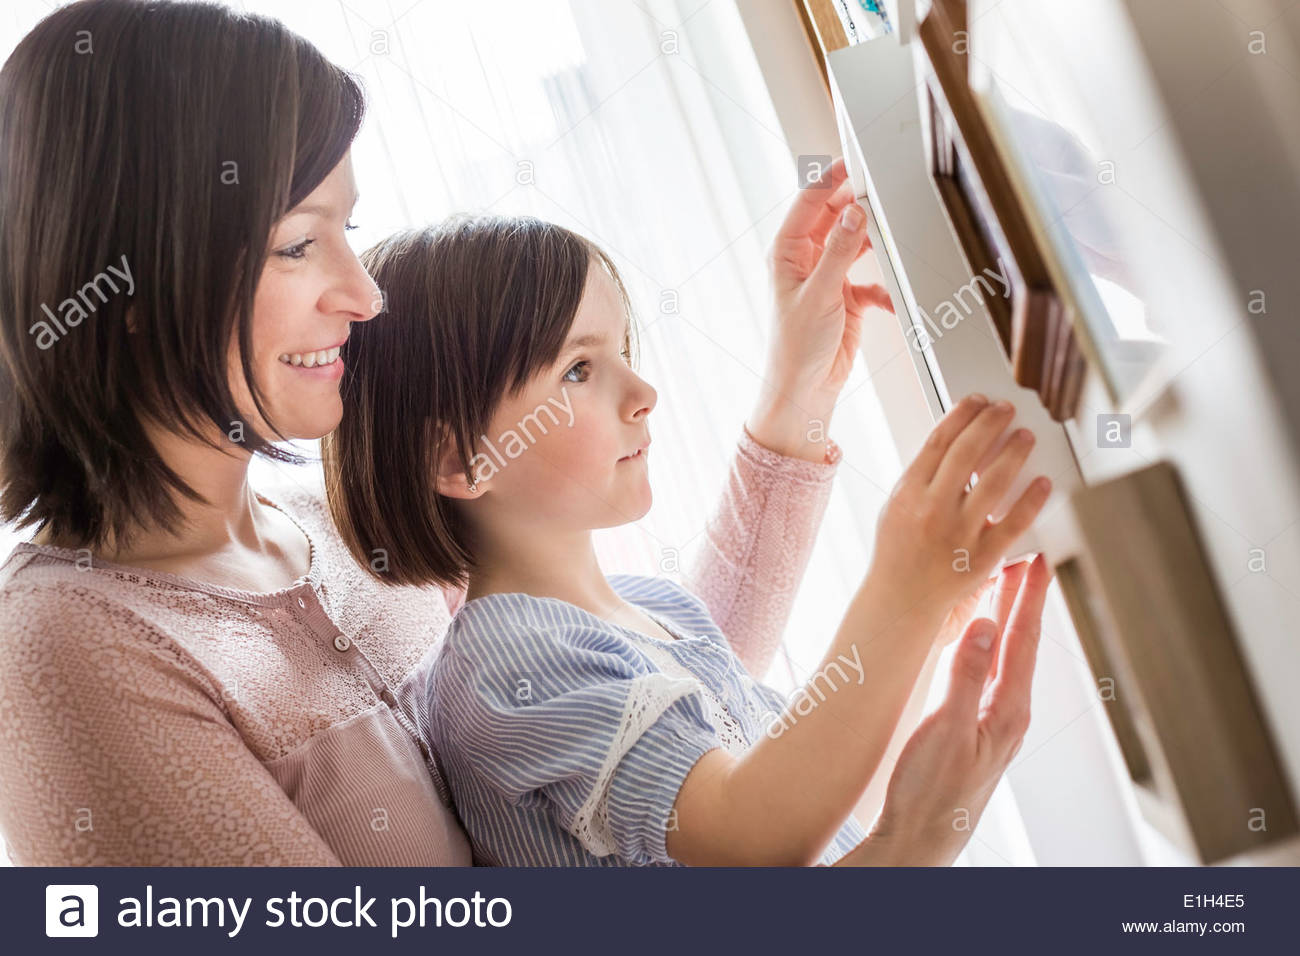 Madre e hija ajuste de imagen Imagen De Stock